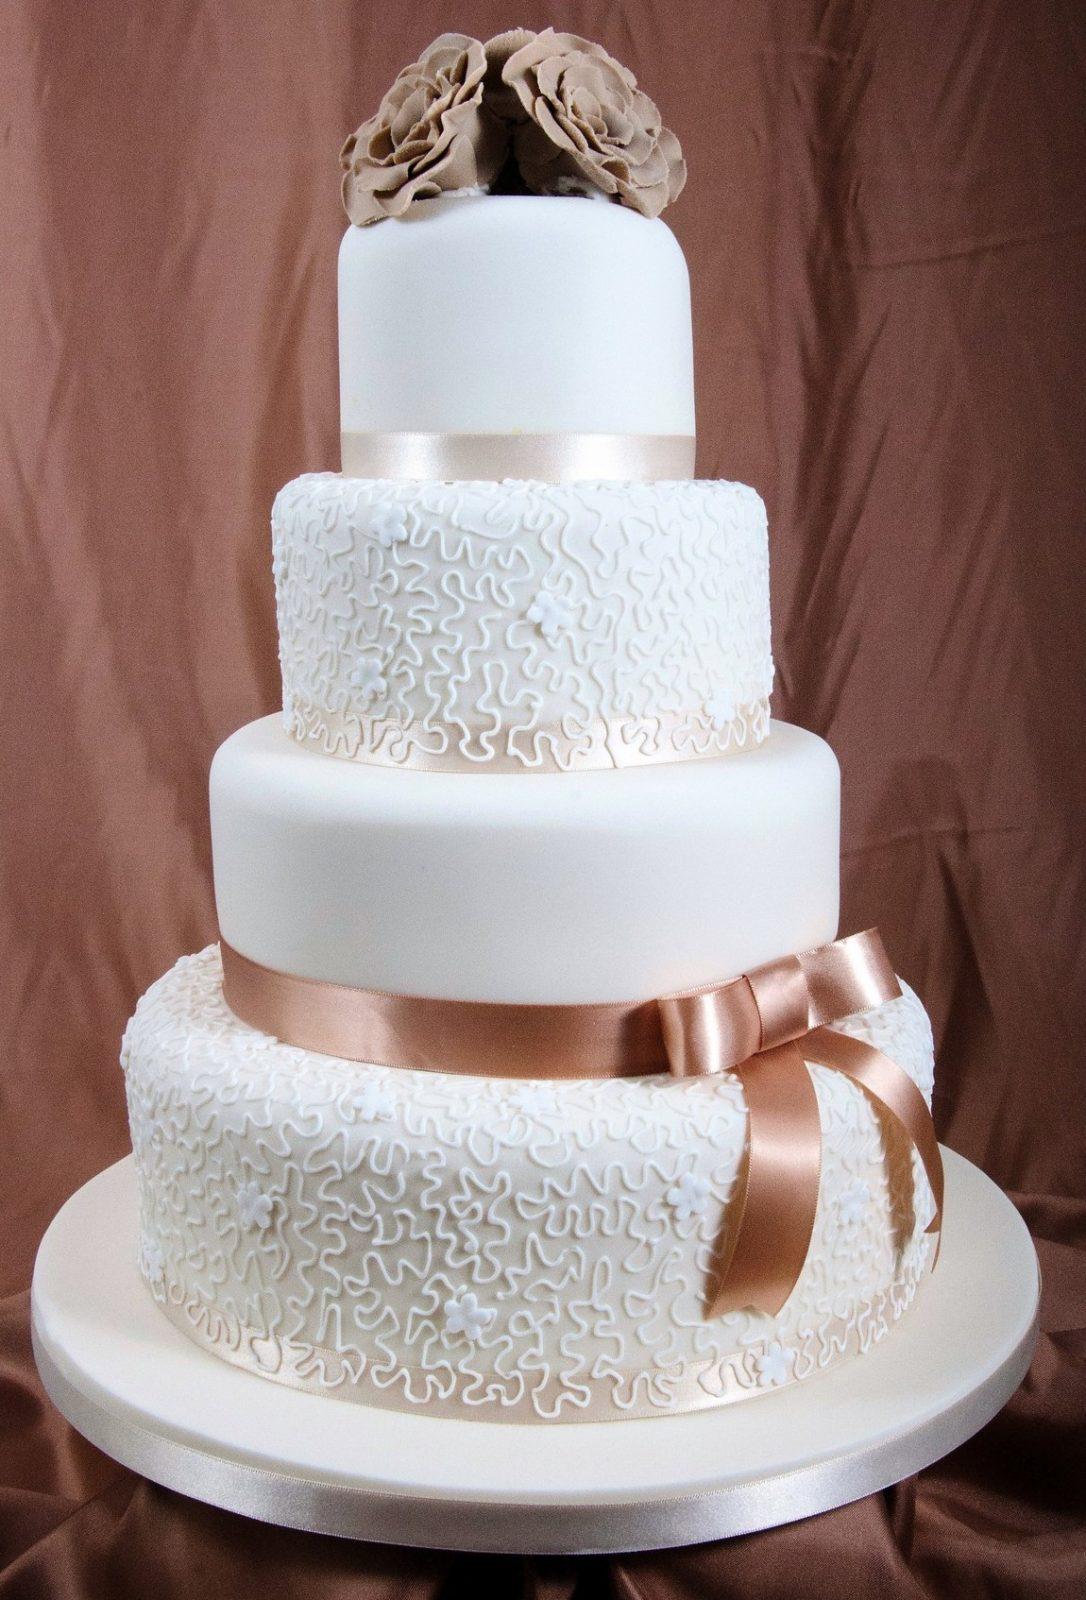 Versatile Ideas For Your Wedding